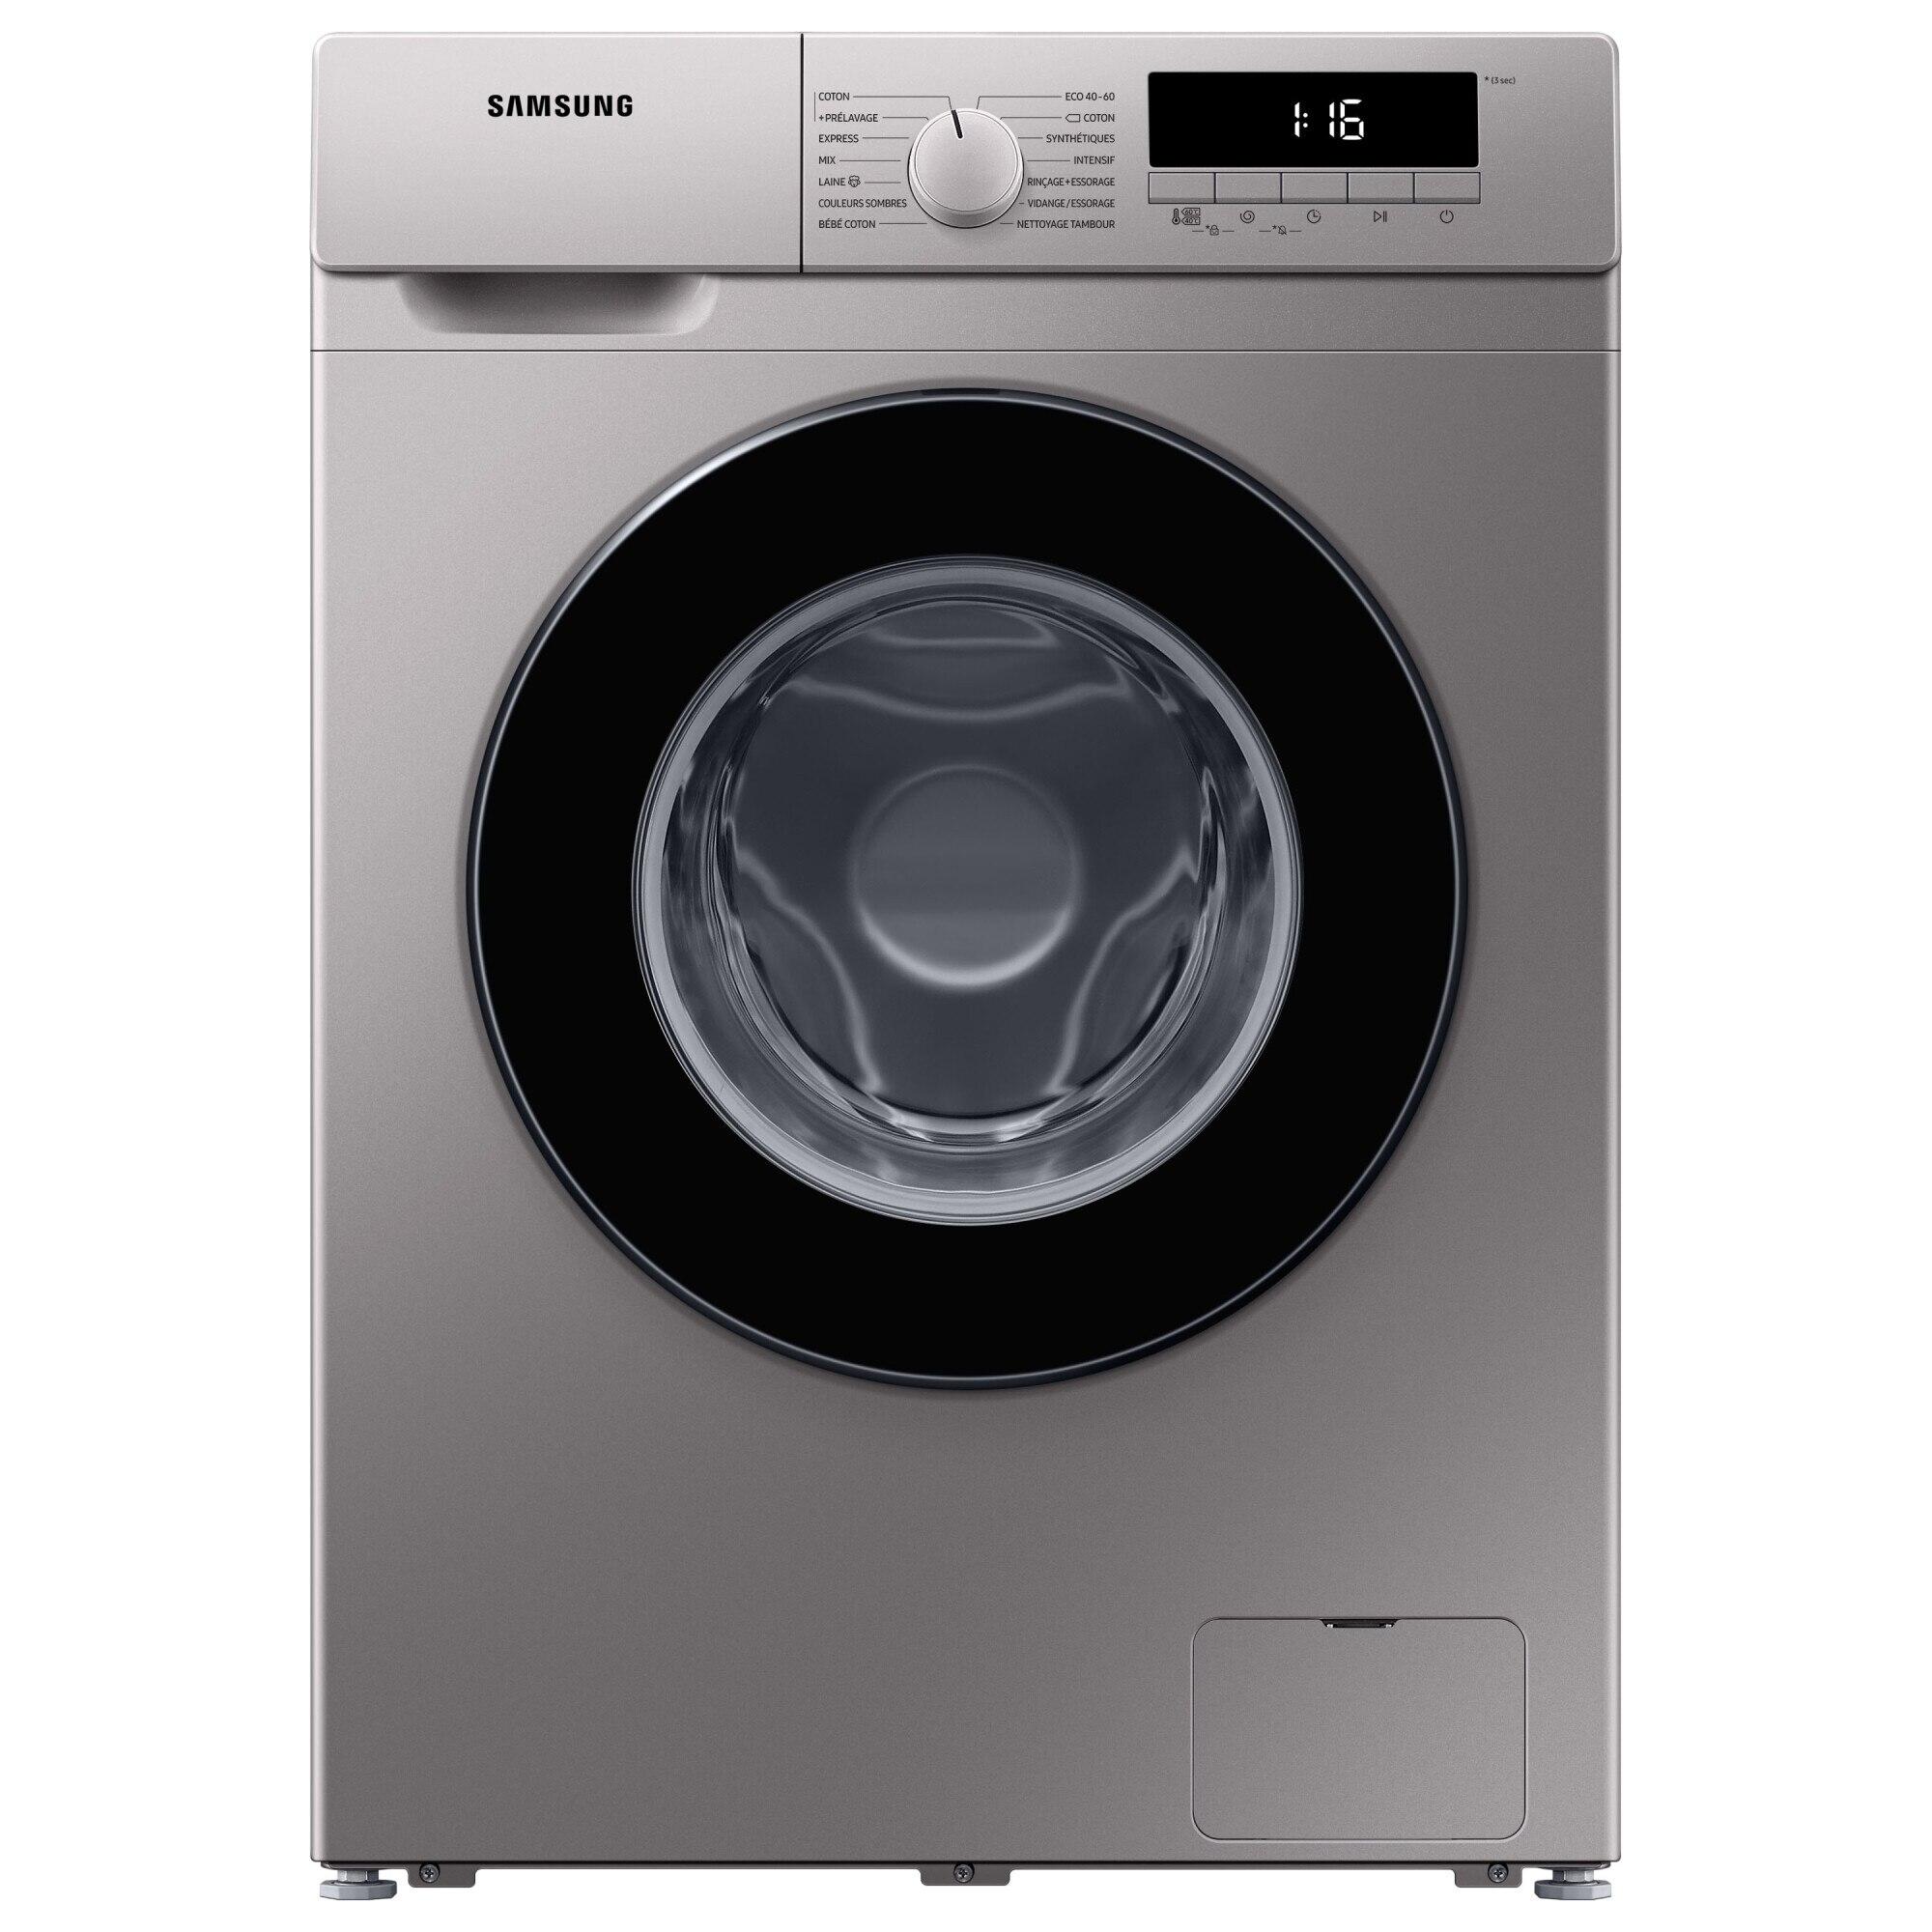 Fotografie Masina de spalat rufe Slim Samsung WW80T304MBS/LE, 8 kg, 1400 RPM, Clasa D, Smart Check, Drum Clean, Motor Digital Inverter, Argintiu